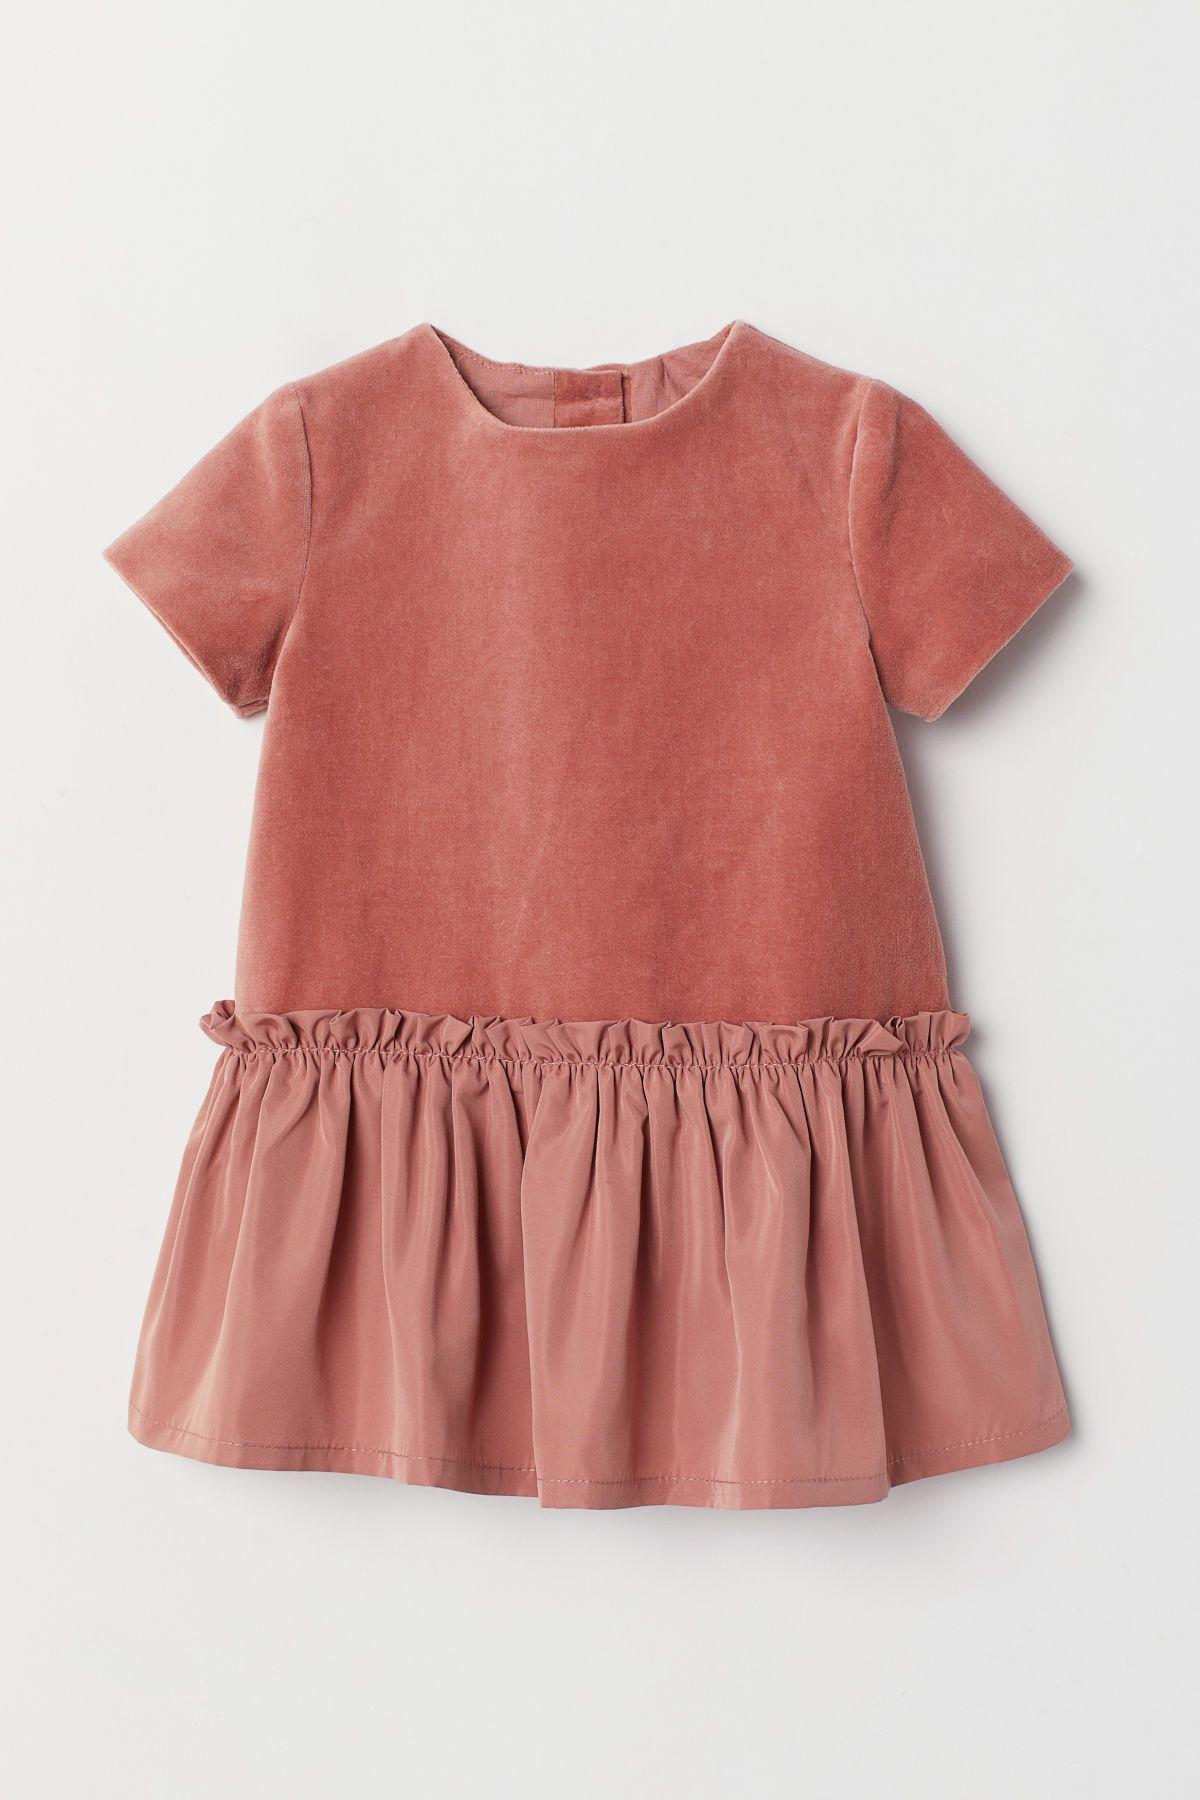 Samtkleid Dunkles Altrosa Kids H M De In 2020 Kleidung Samtkleid Kleinkind Madchen Outfit